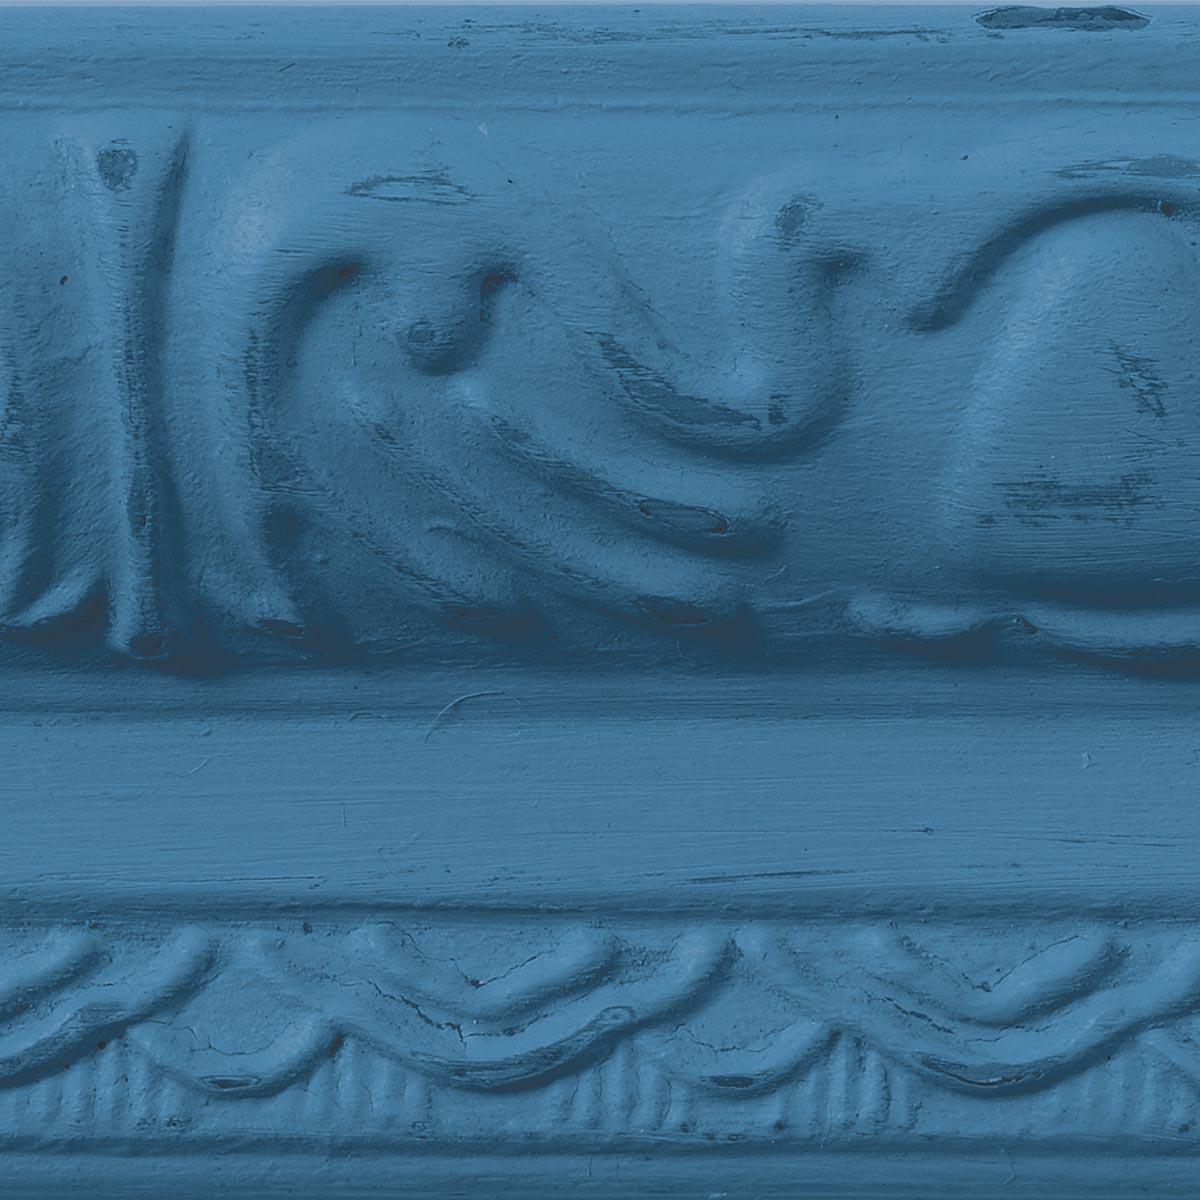 FolkArt ® Home Decor™ Chalk - Nantucket Blue, 2 oz. - 6352